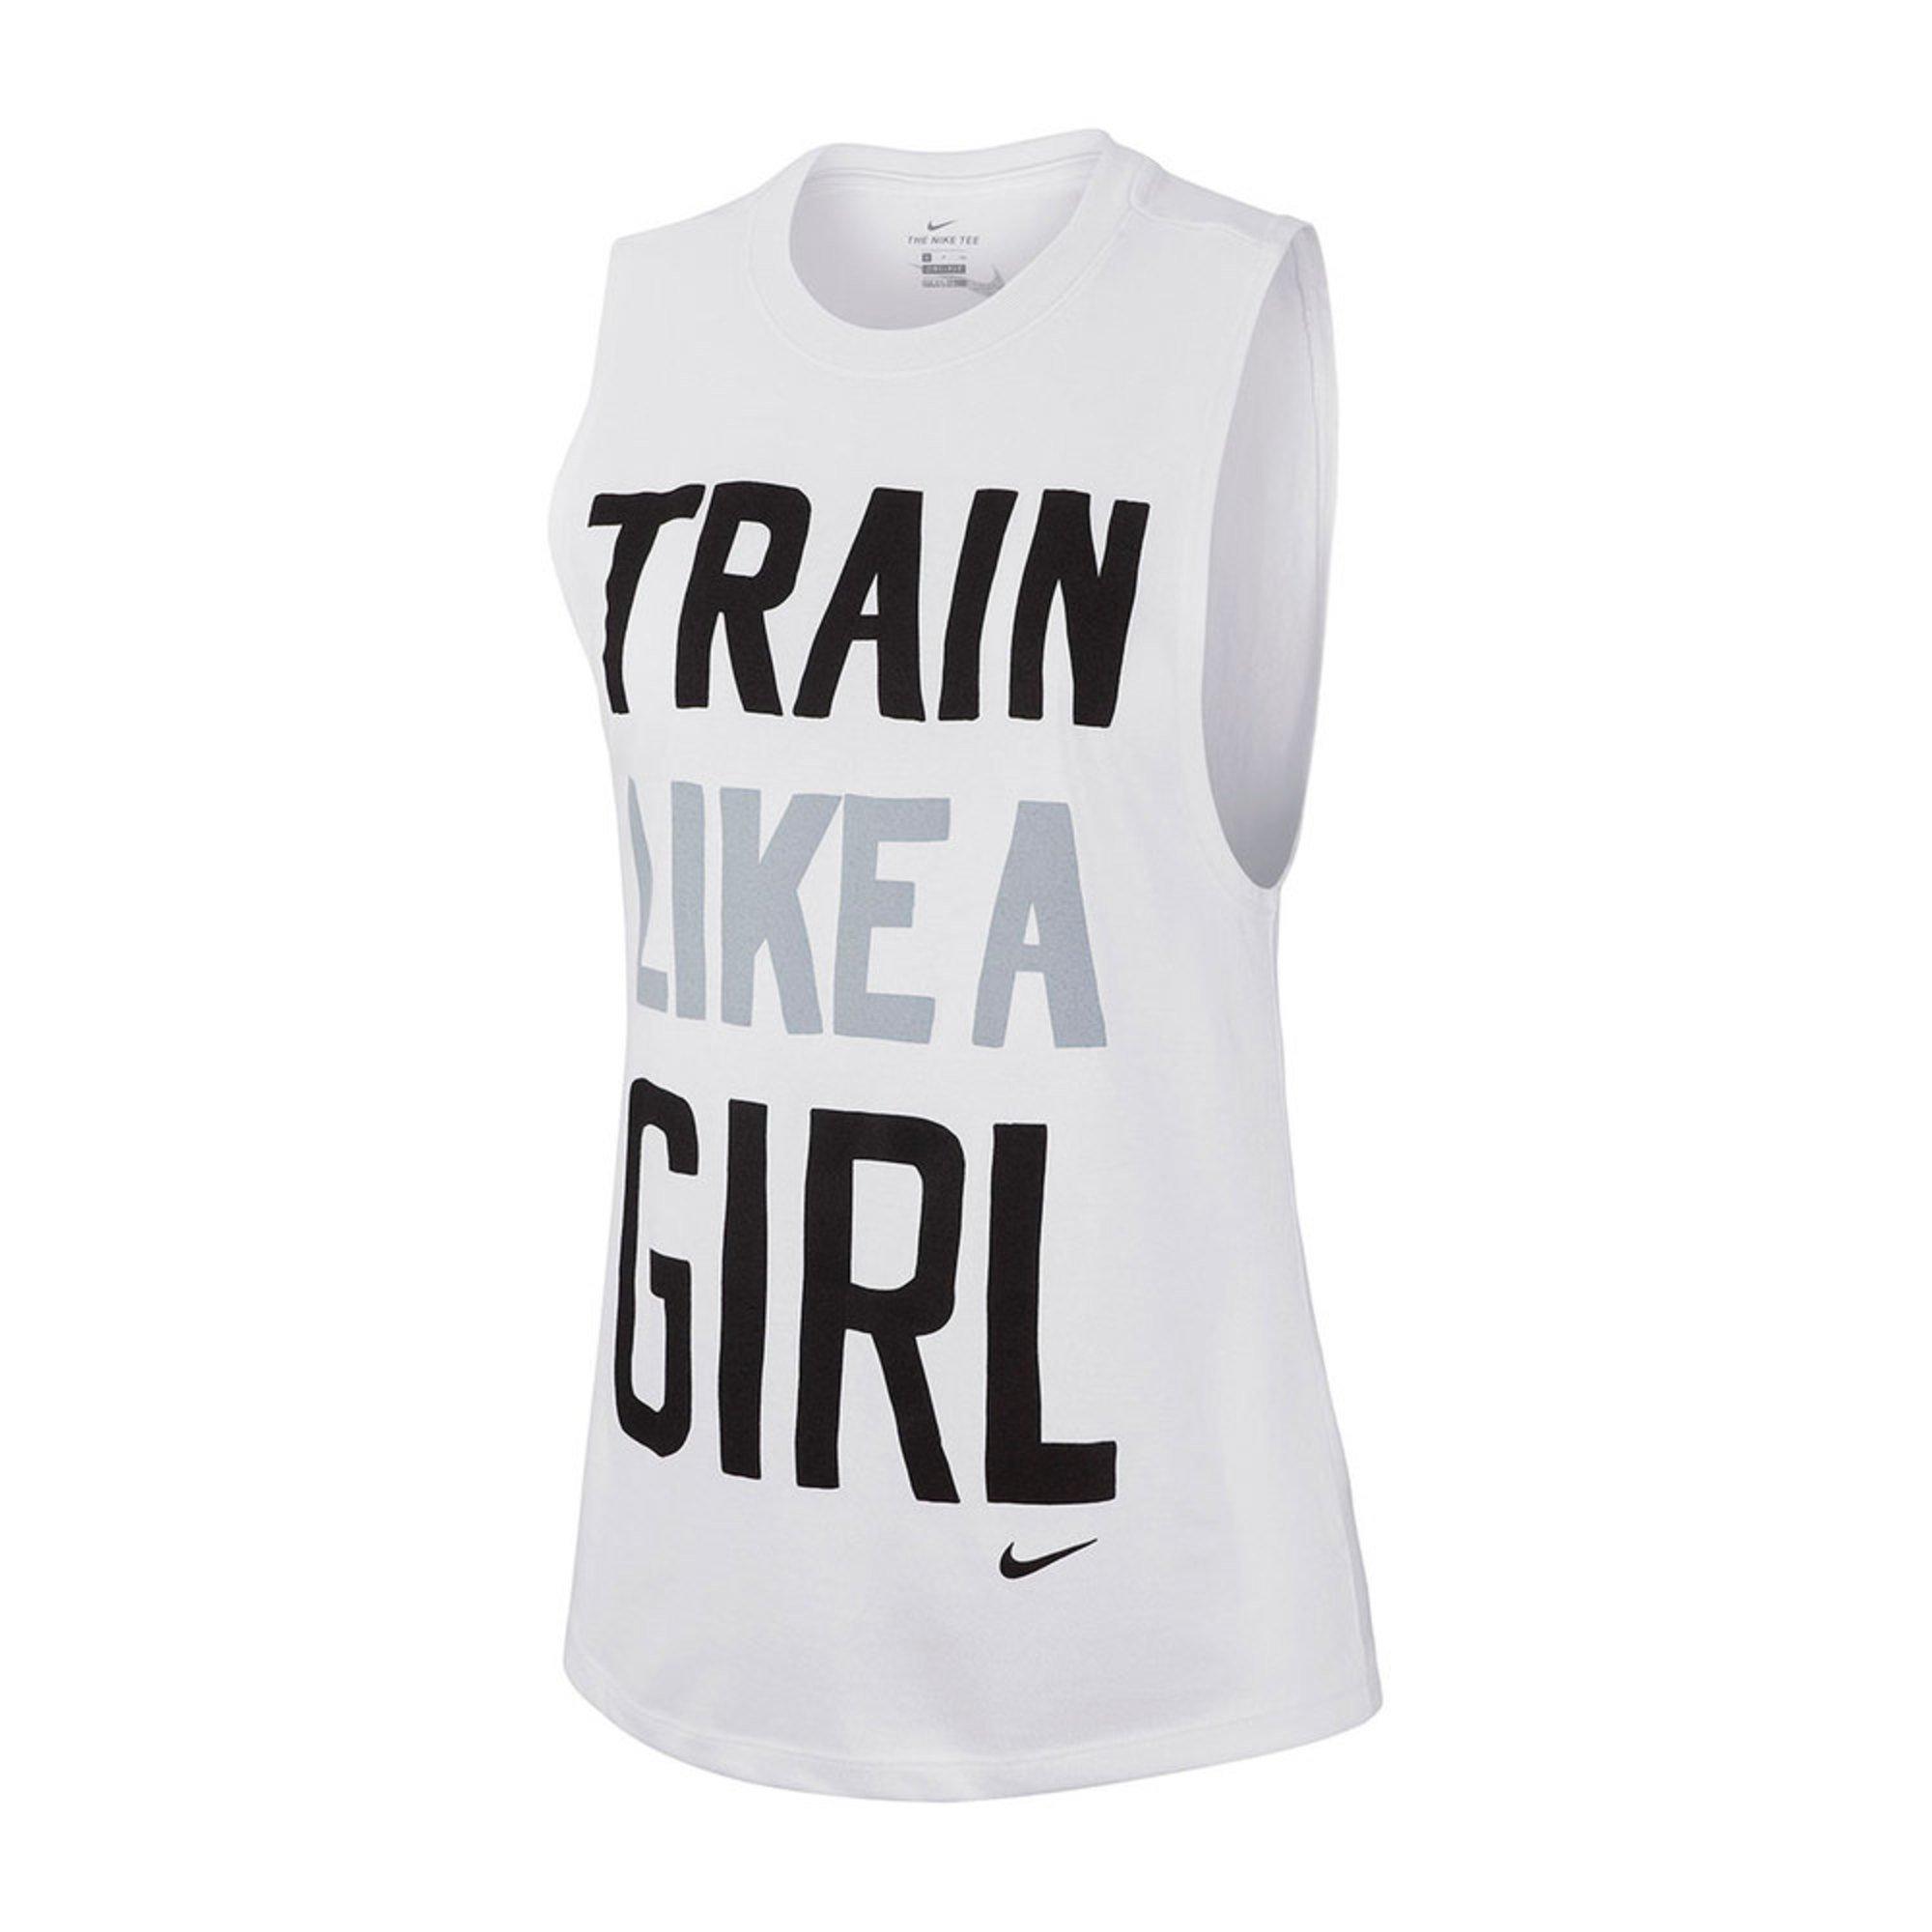 3a63d612b0d39 Nike Women s Nike Dry Tank